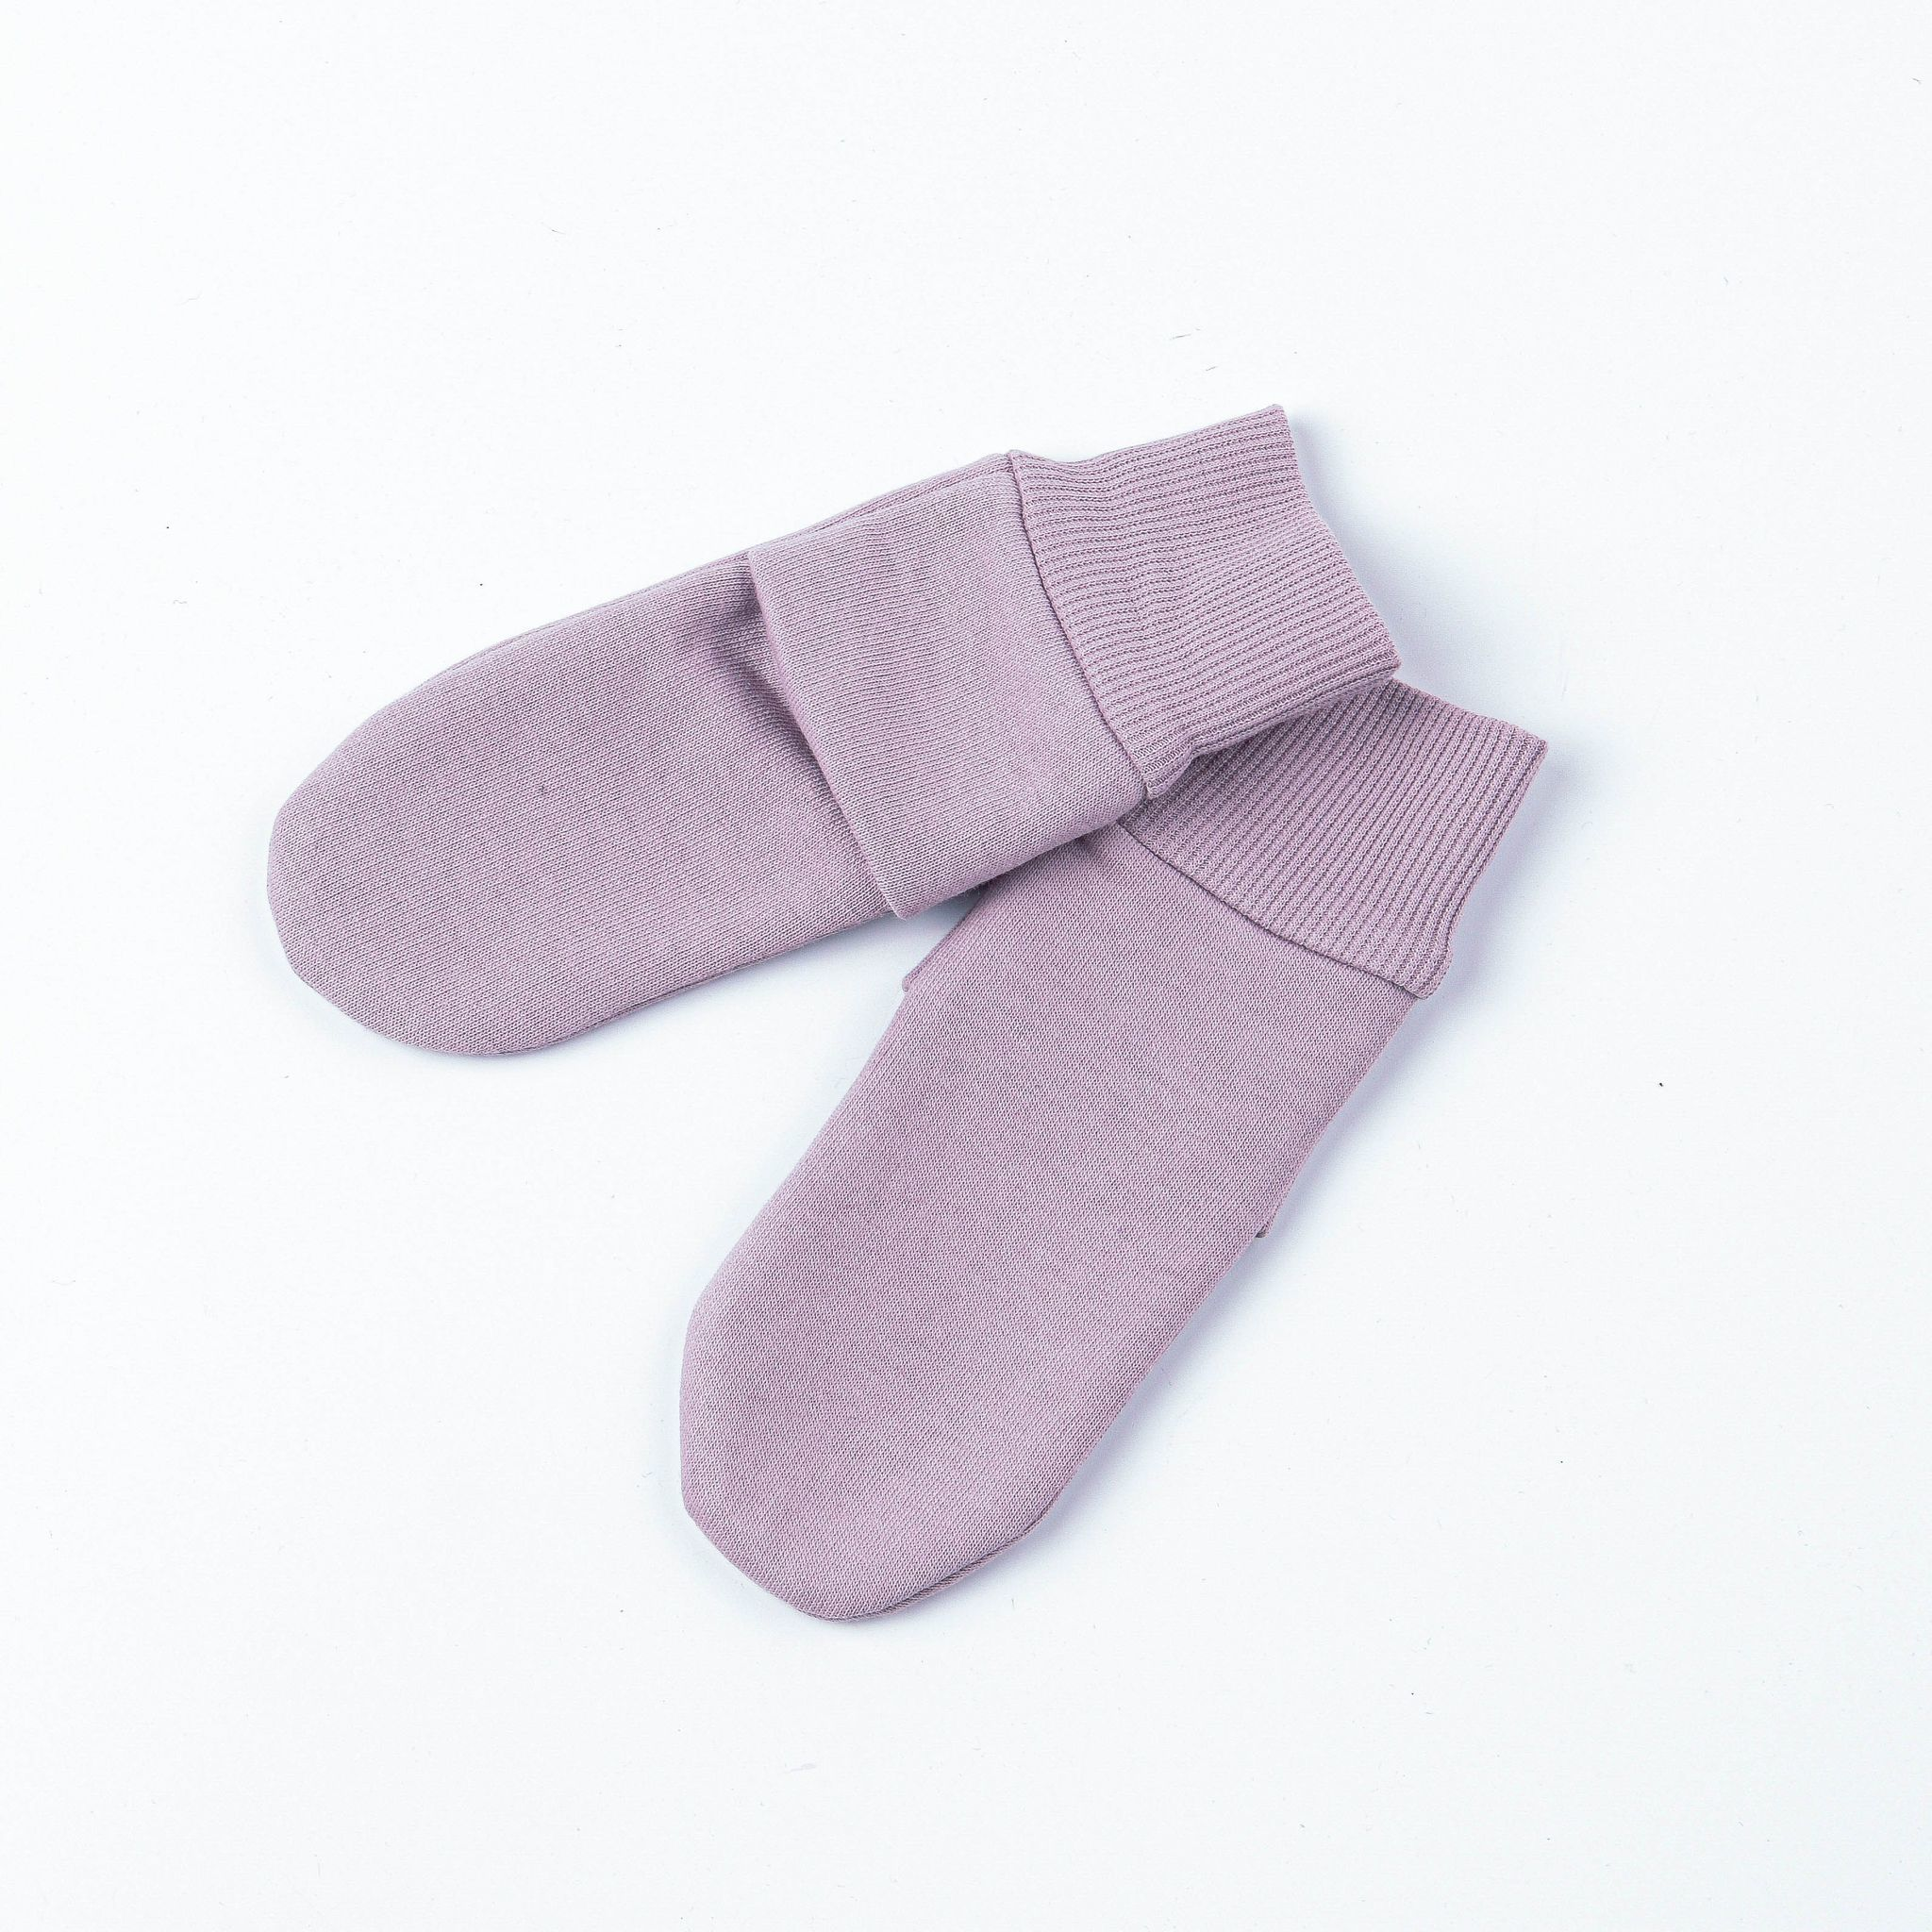 Socks with fleece lining 0+, Heather